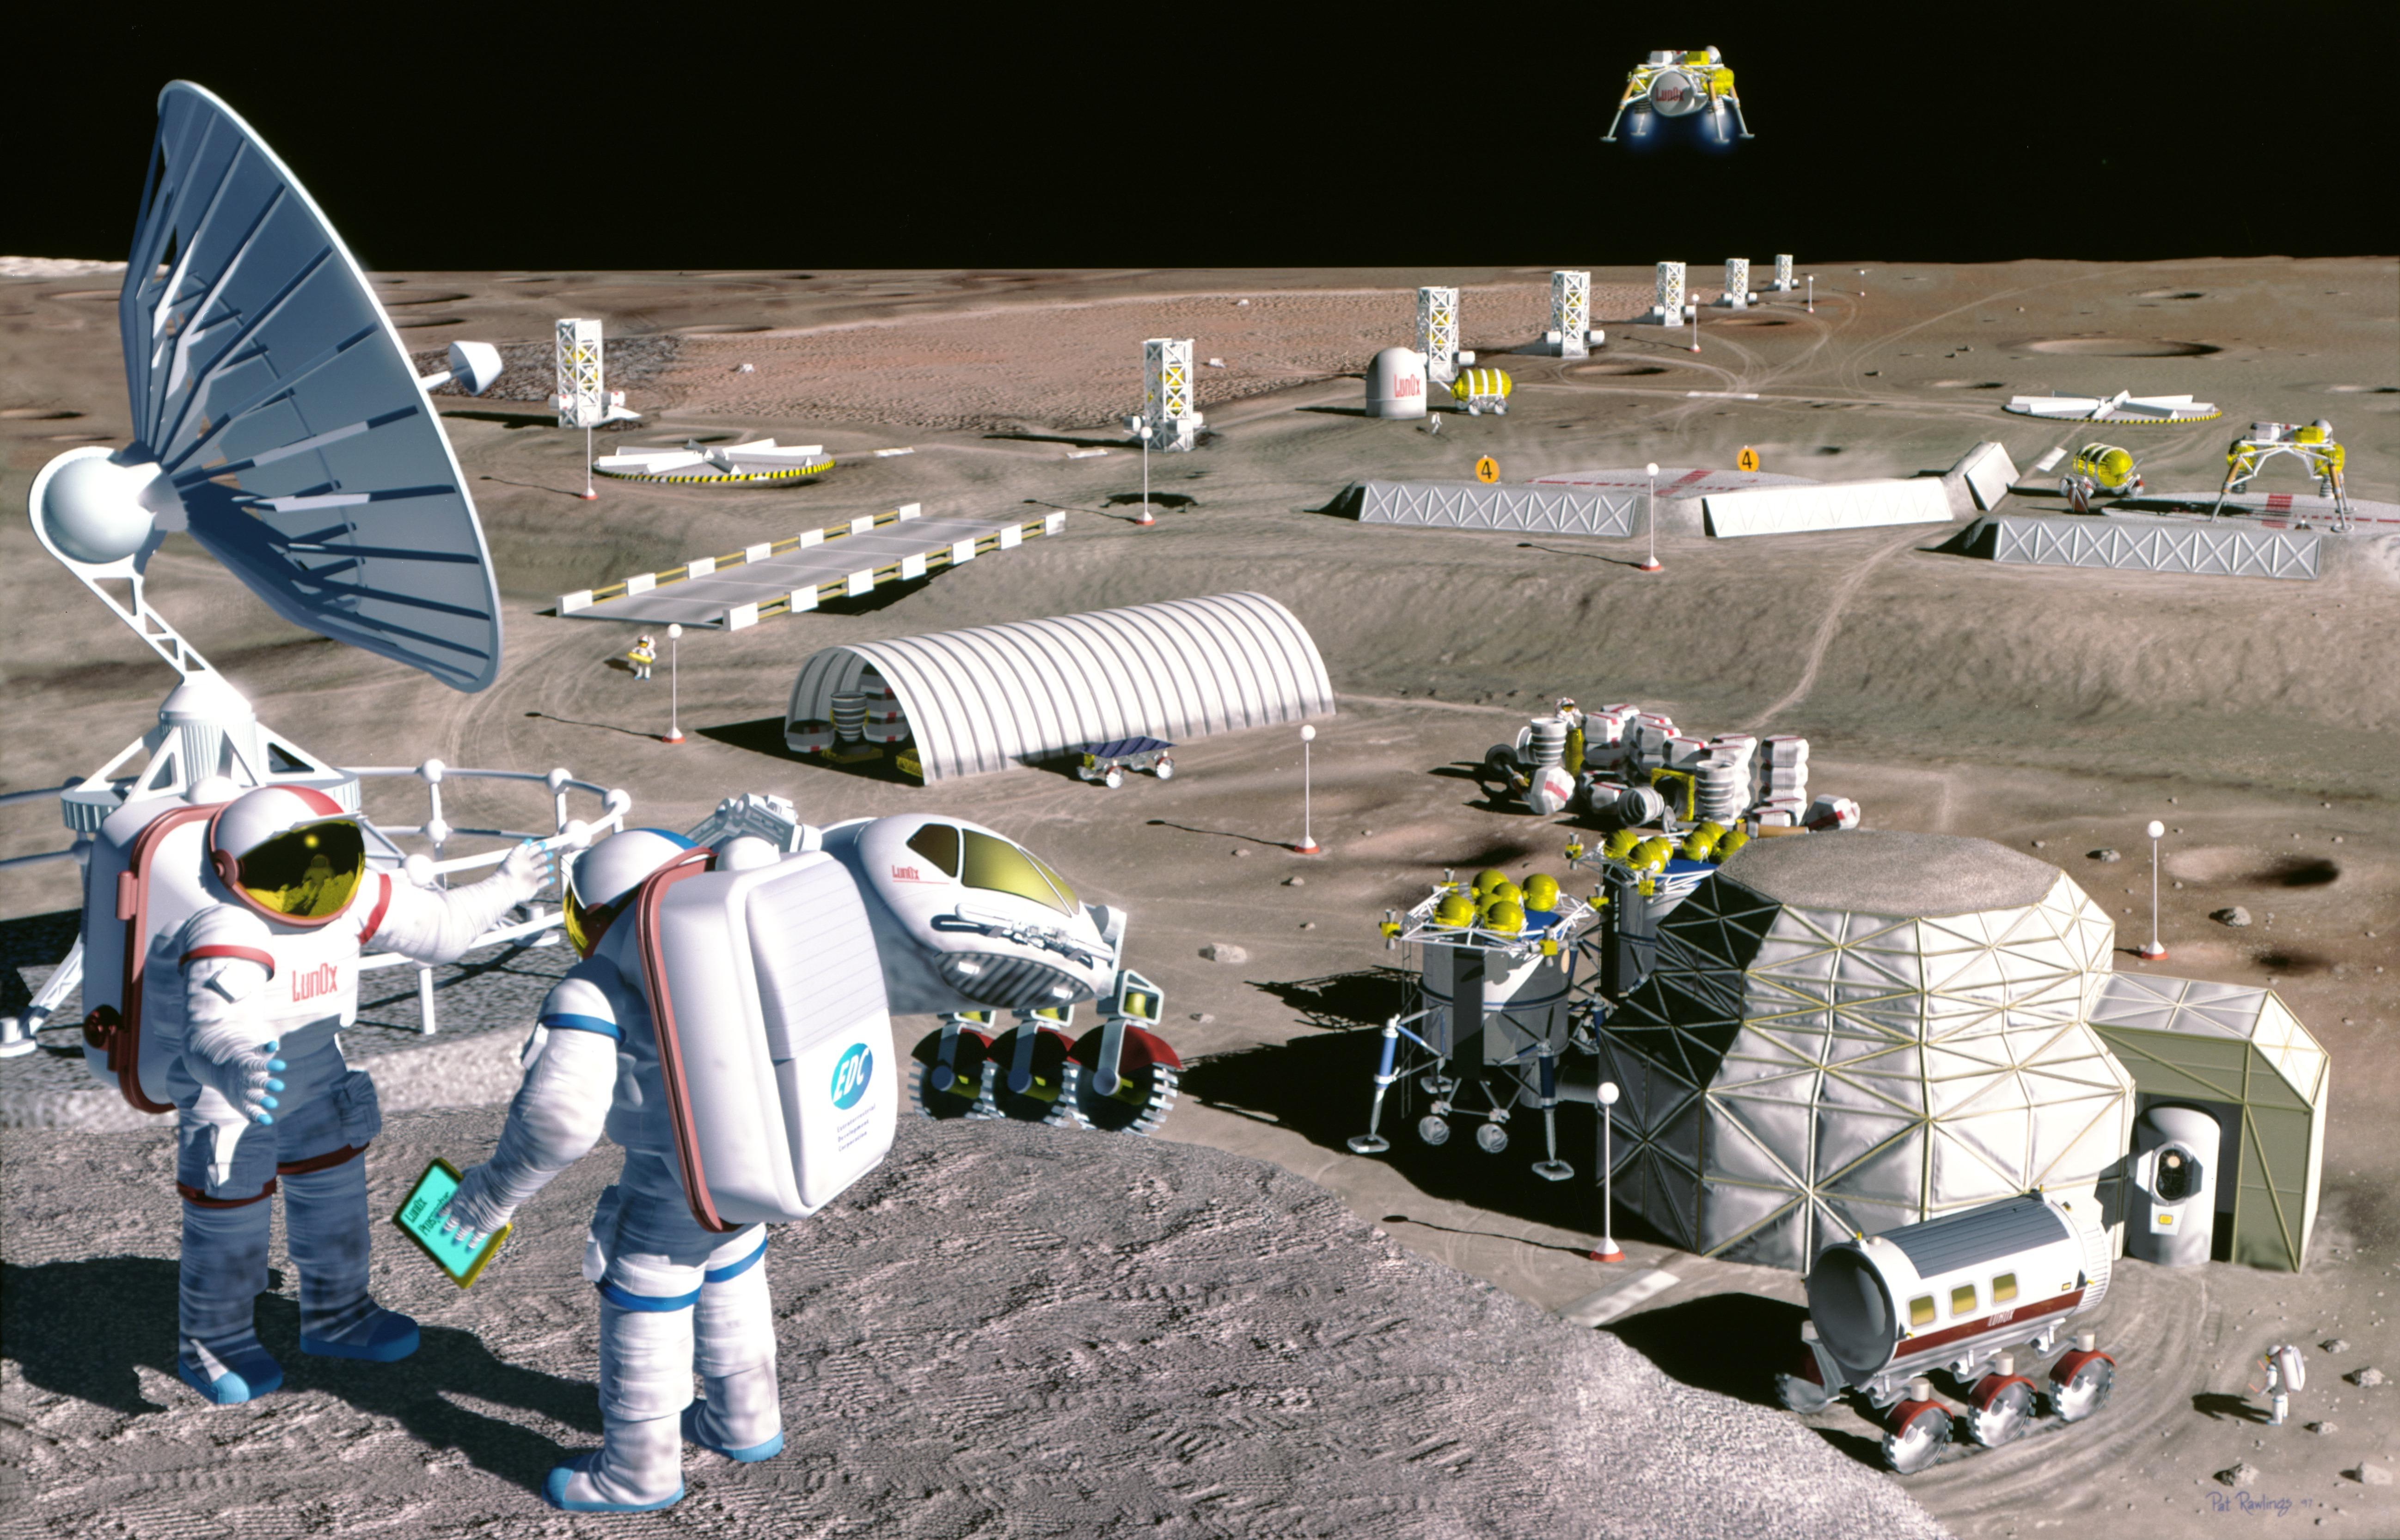 Mooncolony 宇宙から資源調達する時代が到来か?